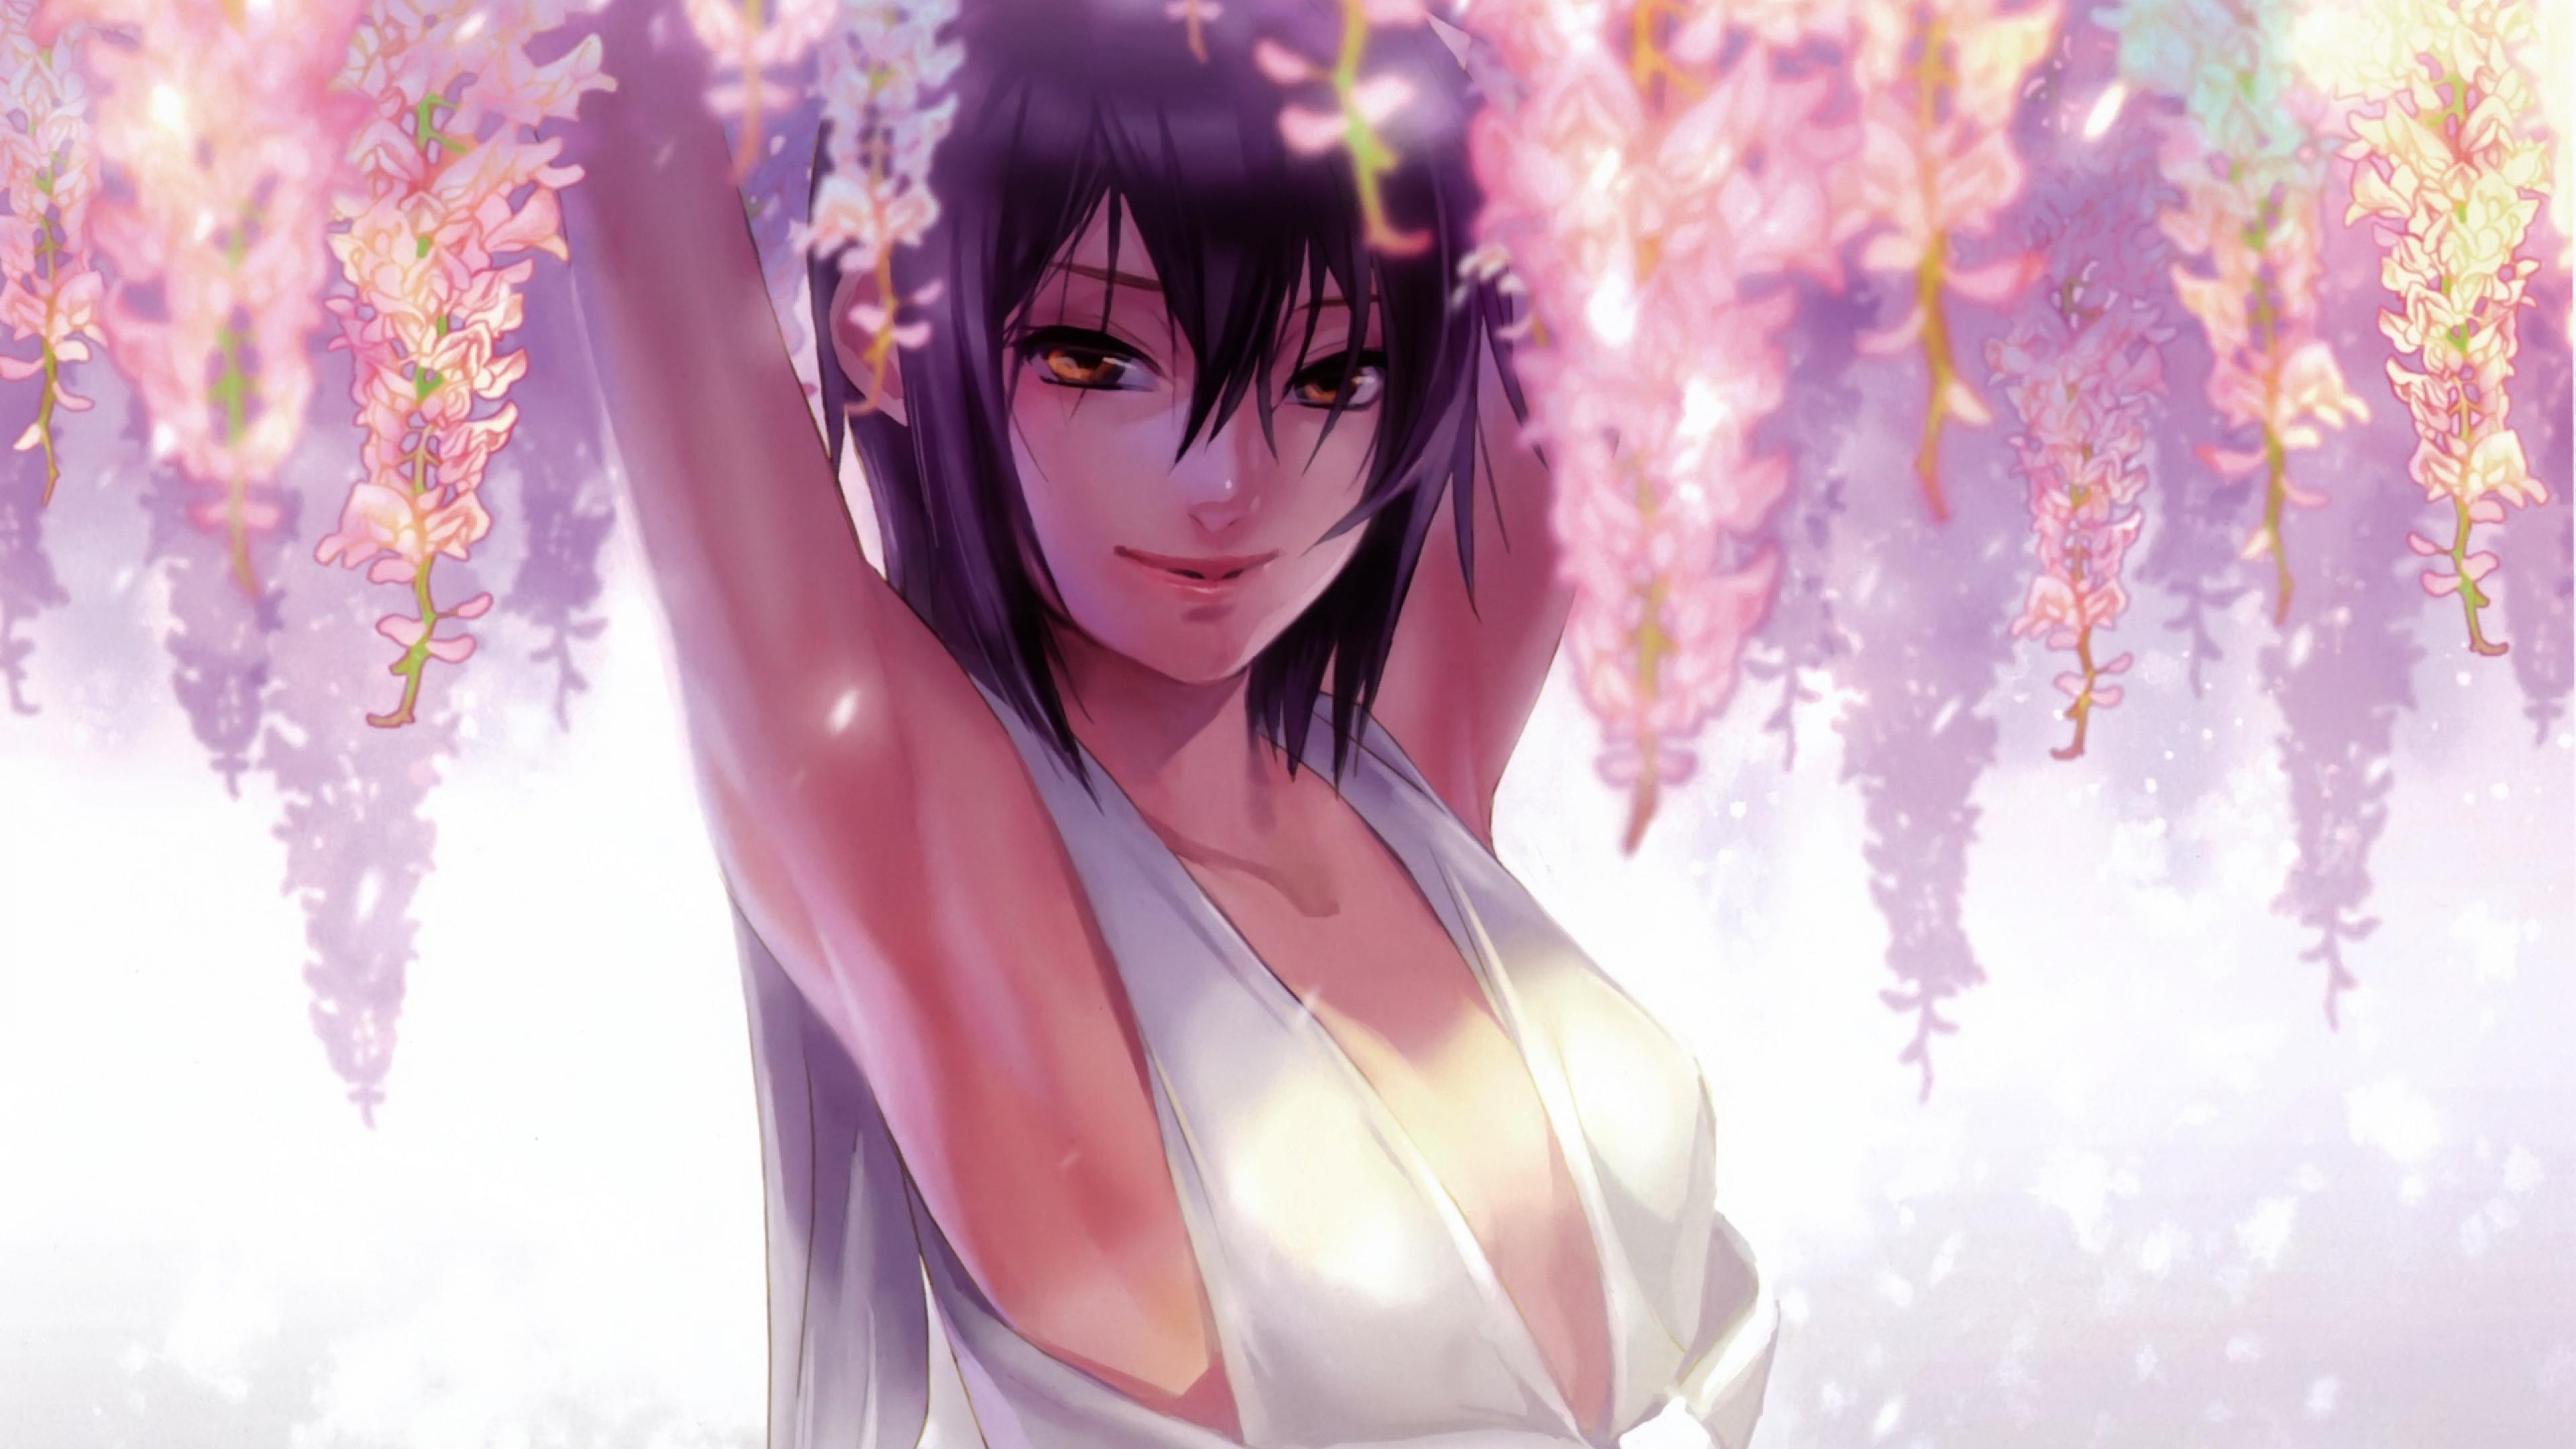 Download Wallpaper 3840x2160 anime girl sun spring image smile 4K 3840x2160